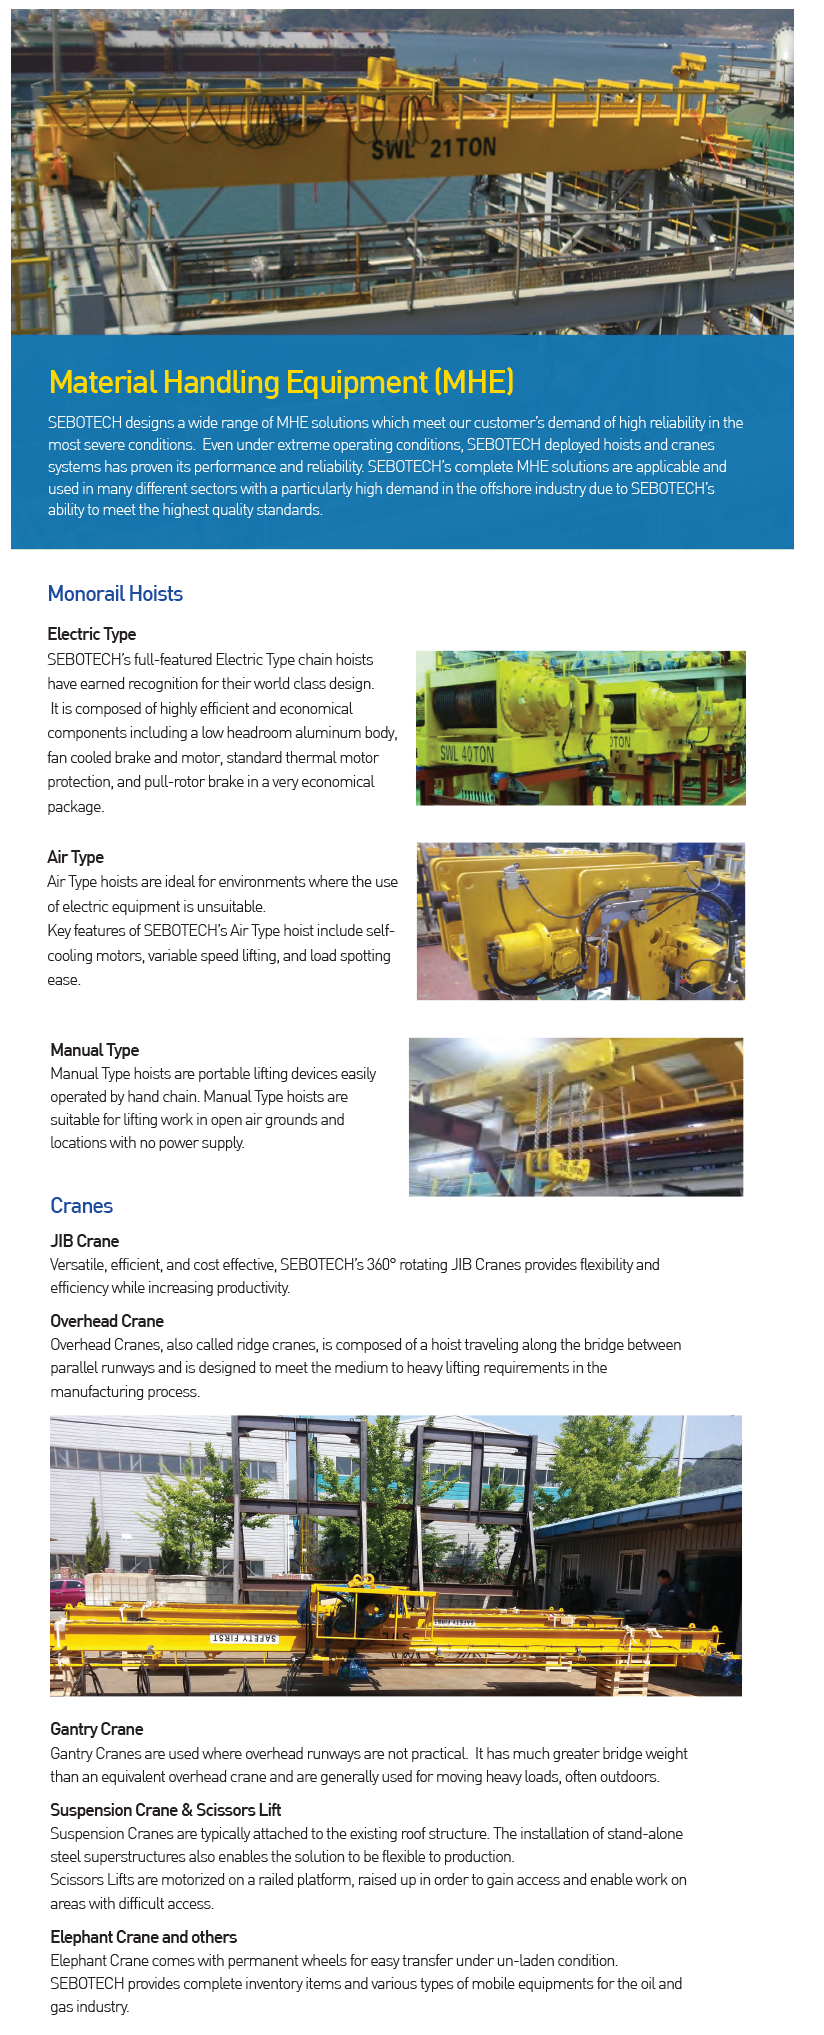 SEBOTECH Material Handling Equipment (MHE)